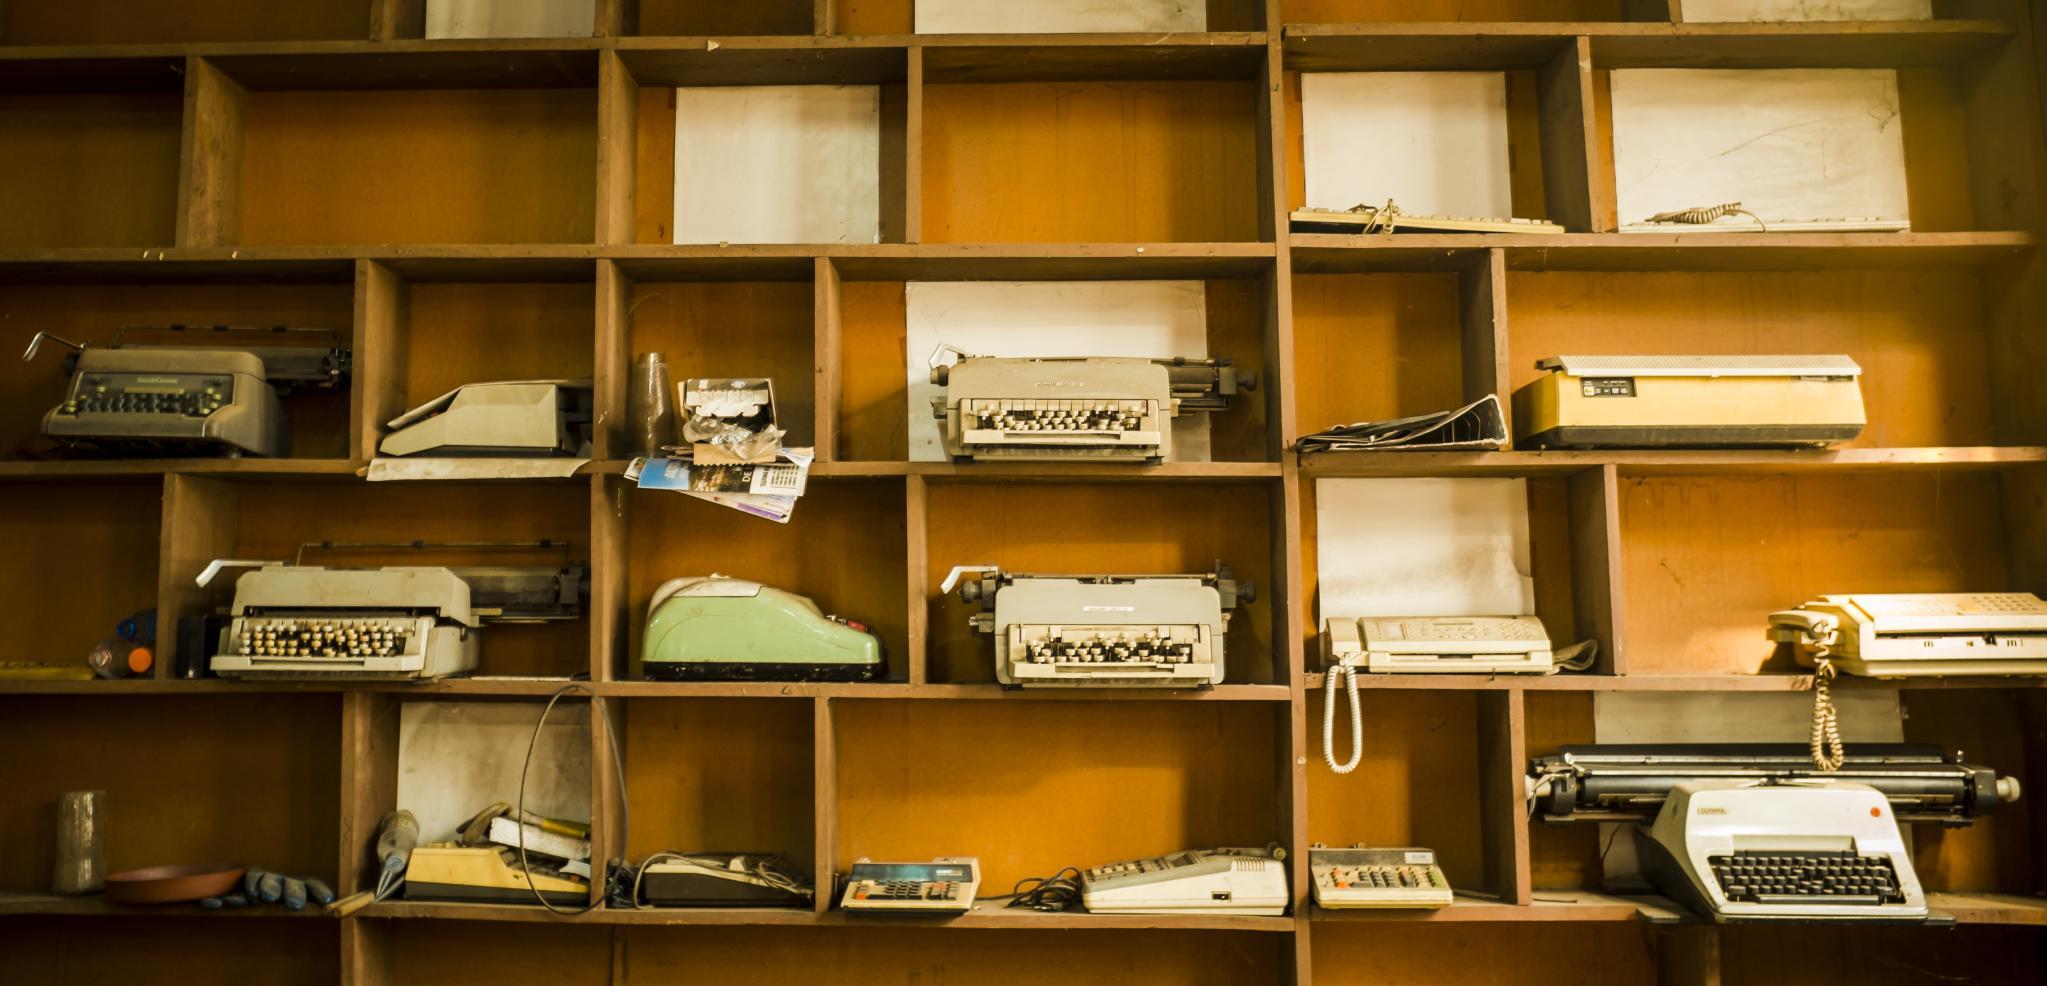 Cementerio de máquinas de escribir. Foto: Carlos Reusser Monsalvez.